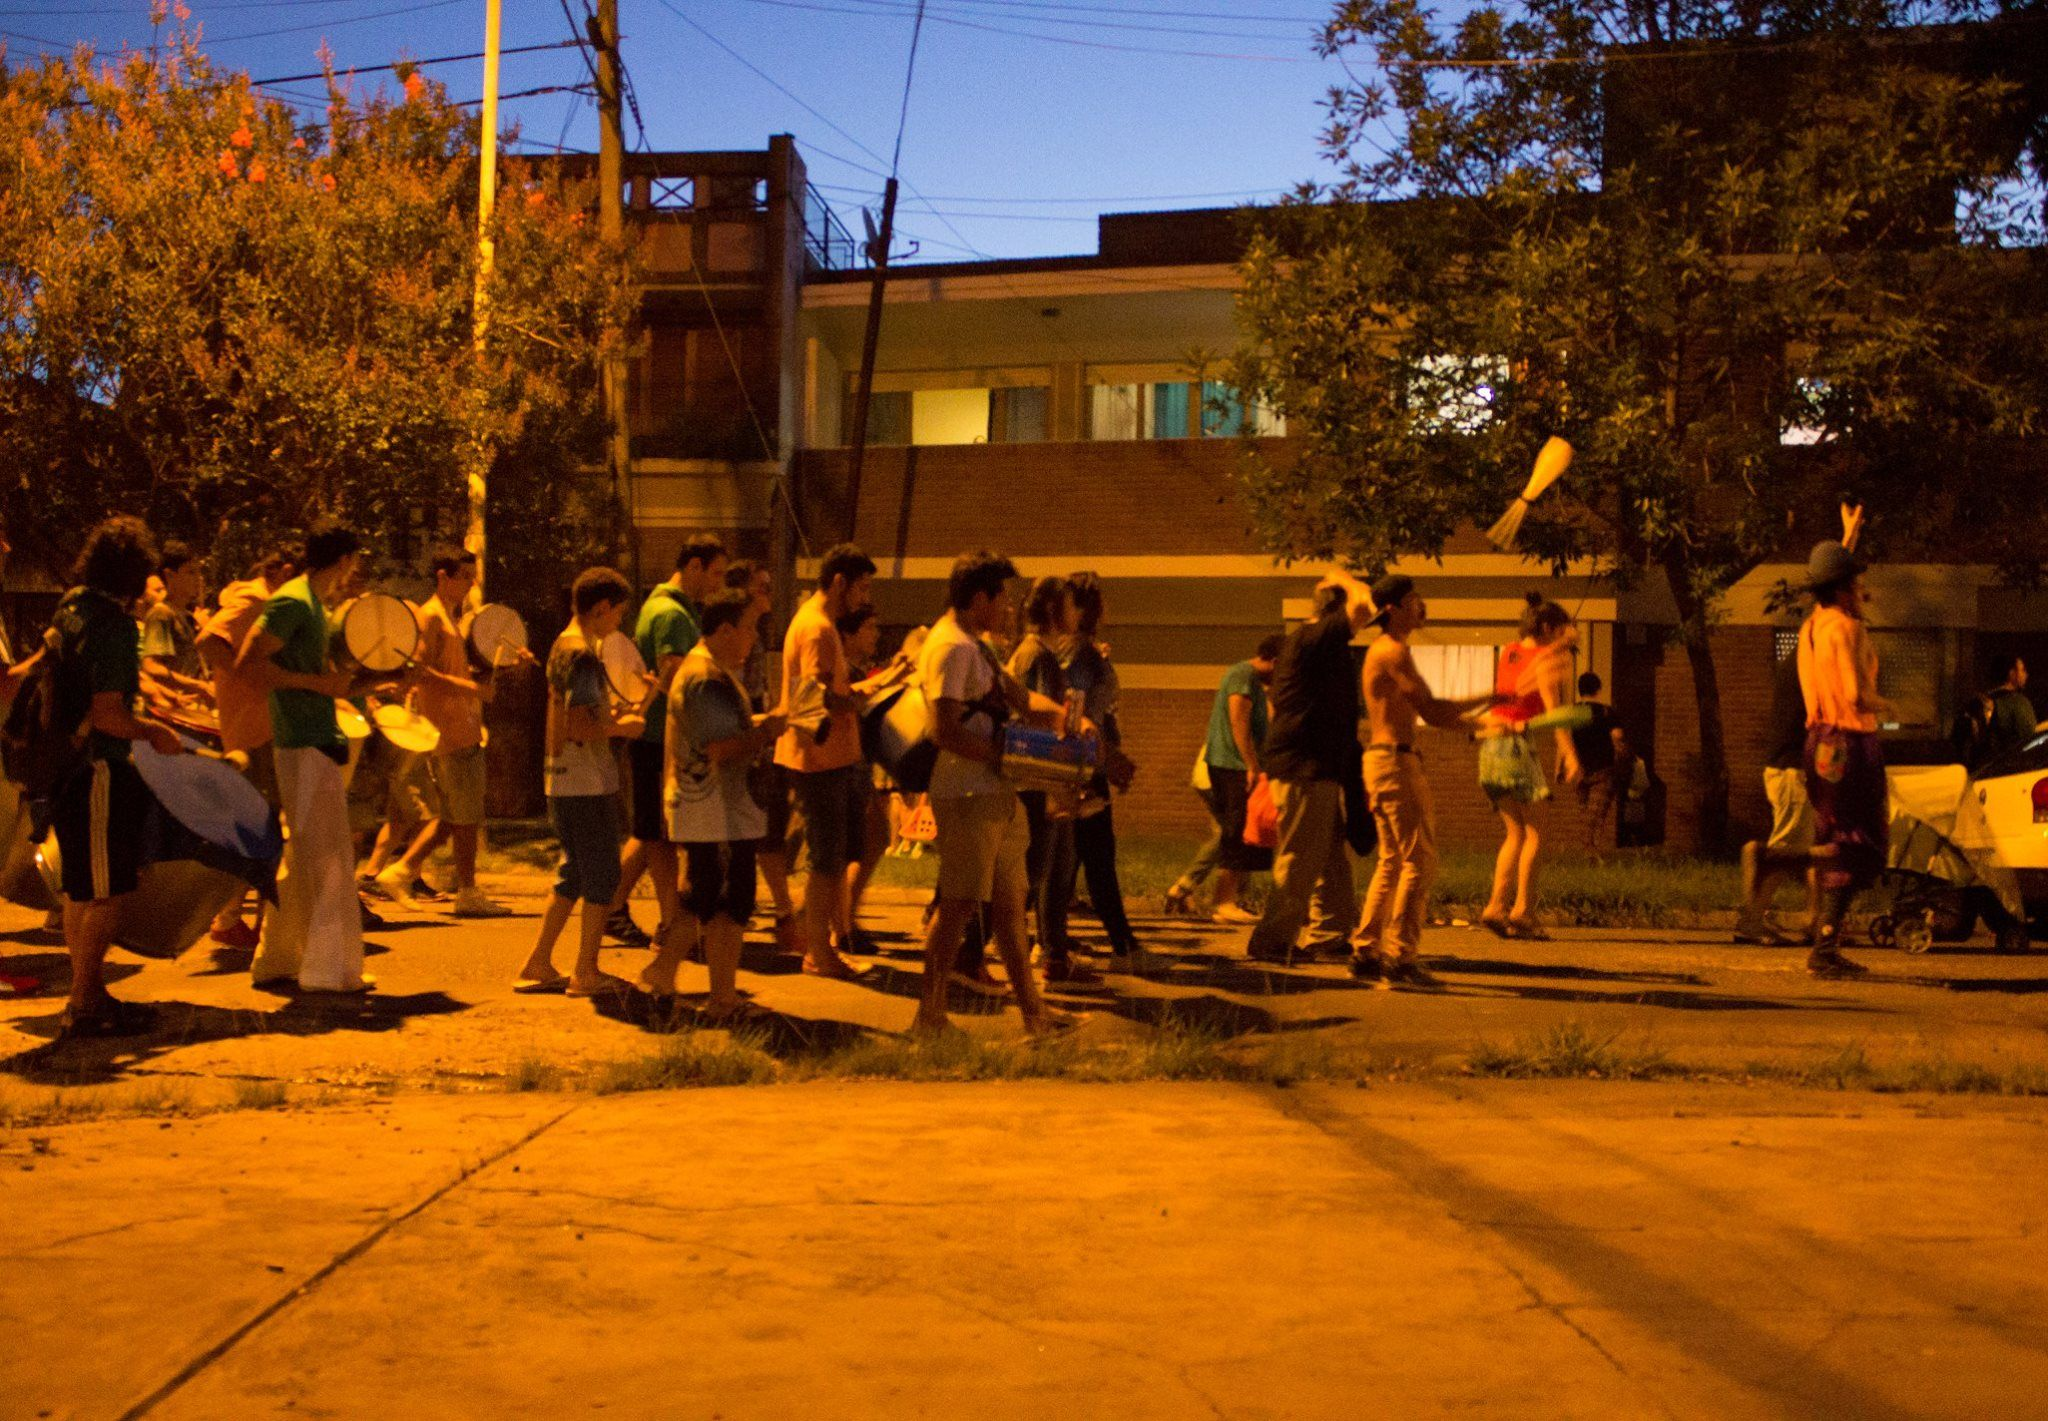 Llegando a La Moringa. Gentileza/Felipe Toscano